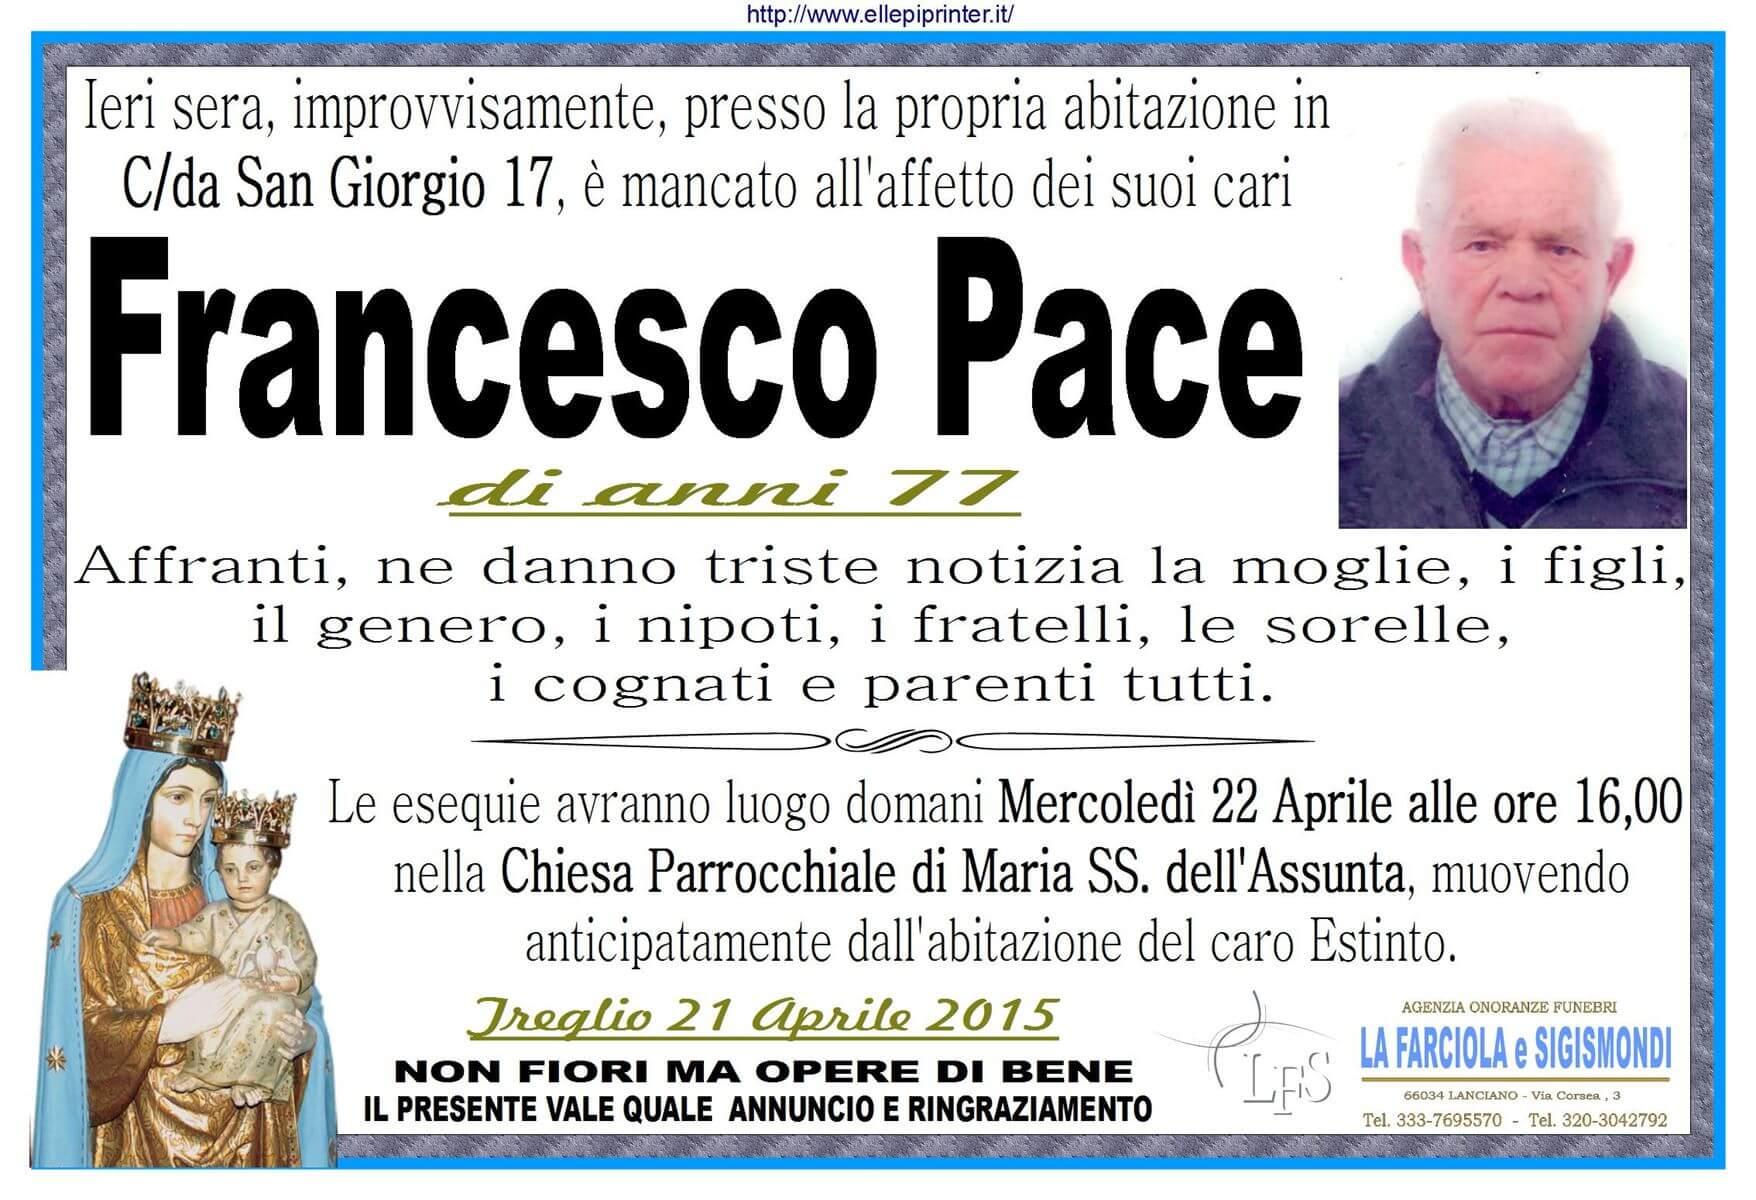 MANIFESTO PACE FRANCESCO